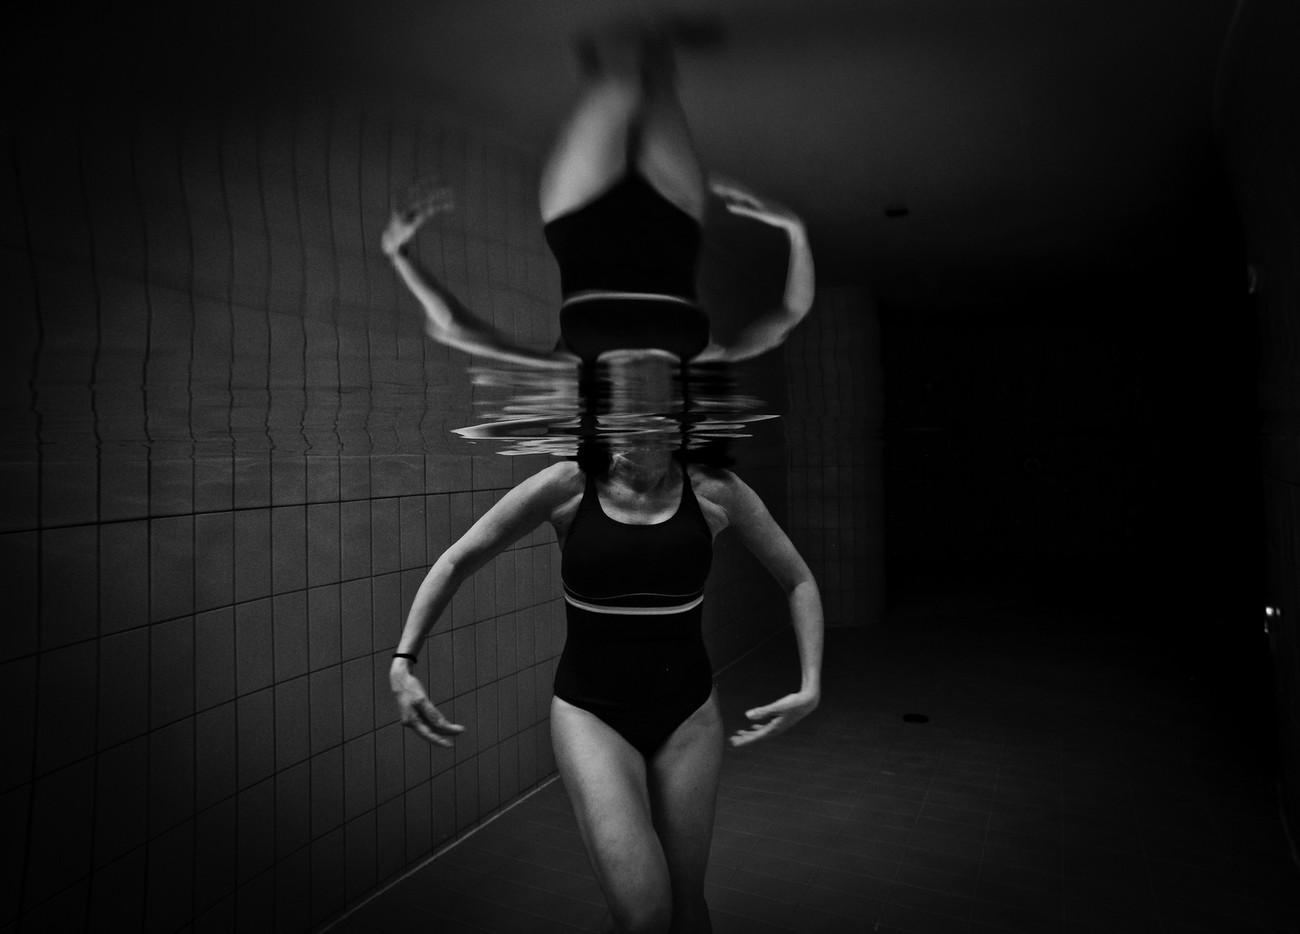 Monochrome Moments Photo Contest Winners